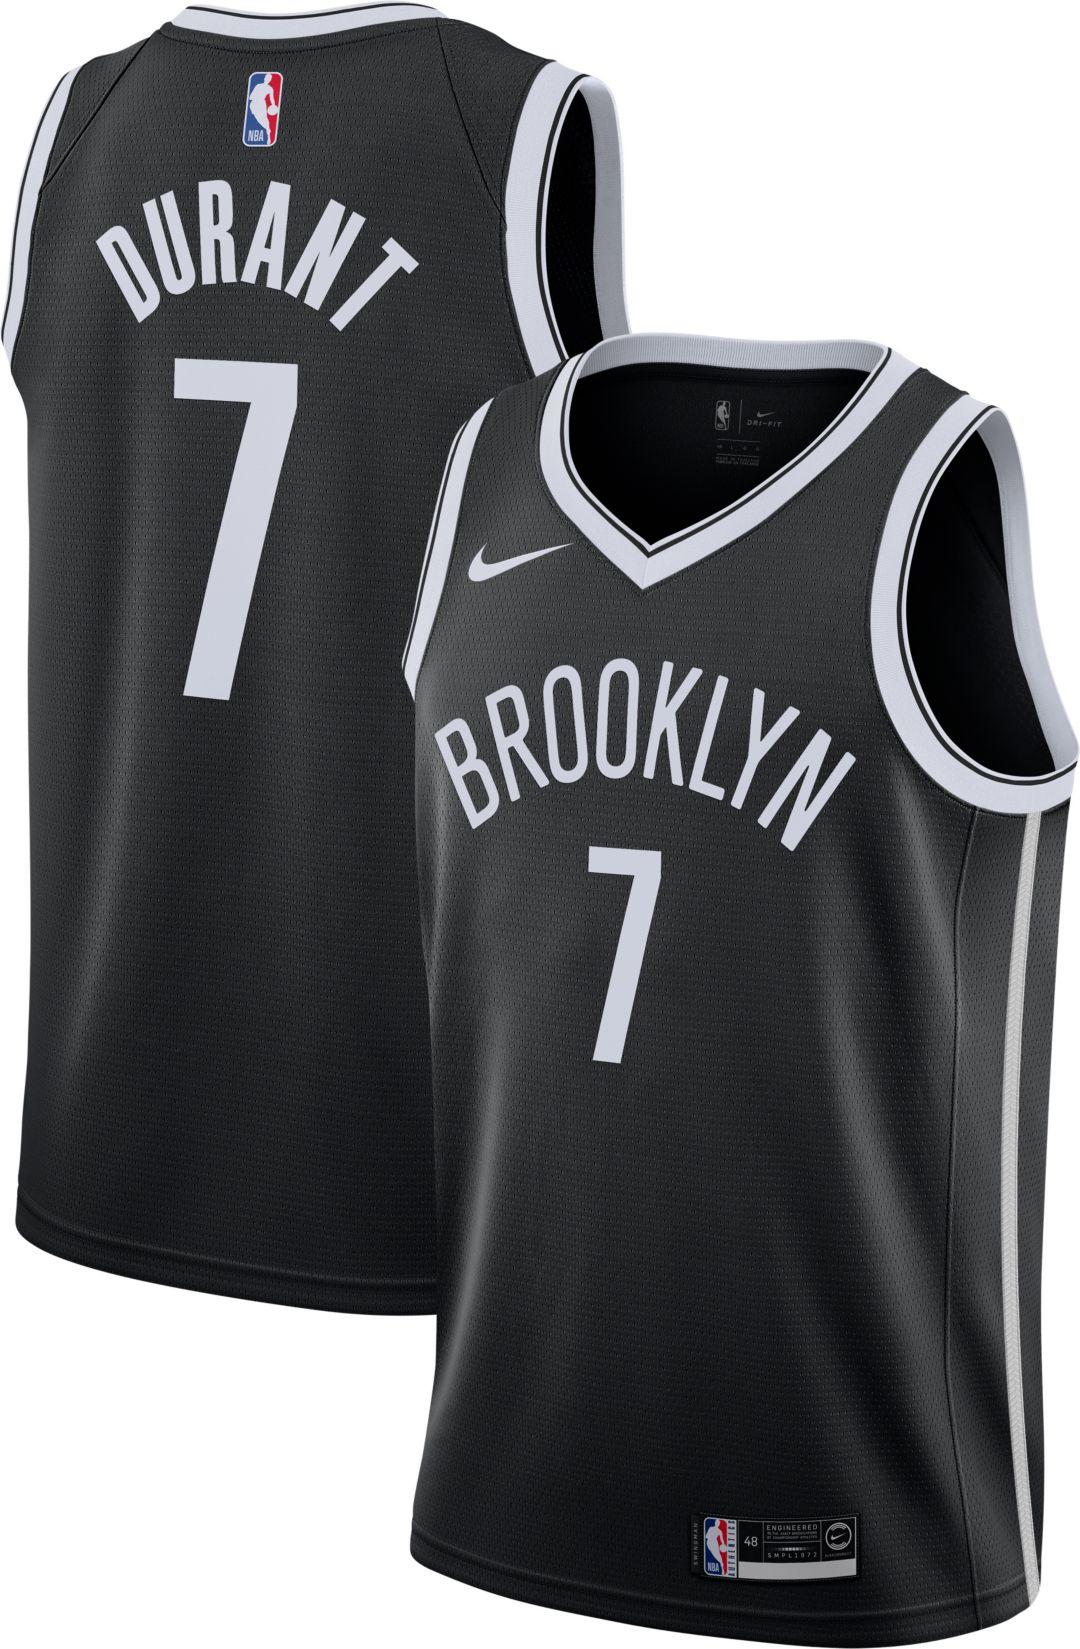 06a21e1c85a Nike Men's Brooklyn Nets Kevin Durant #7 Black Dri-FIT Swingman Jersey